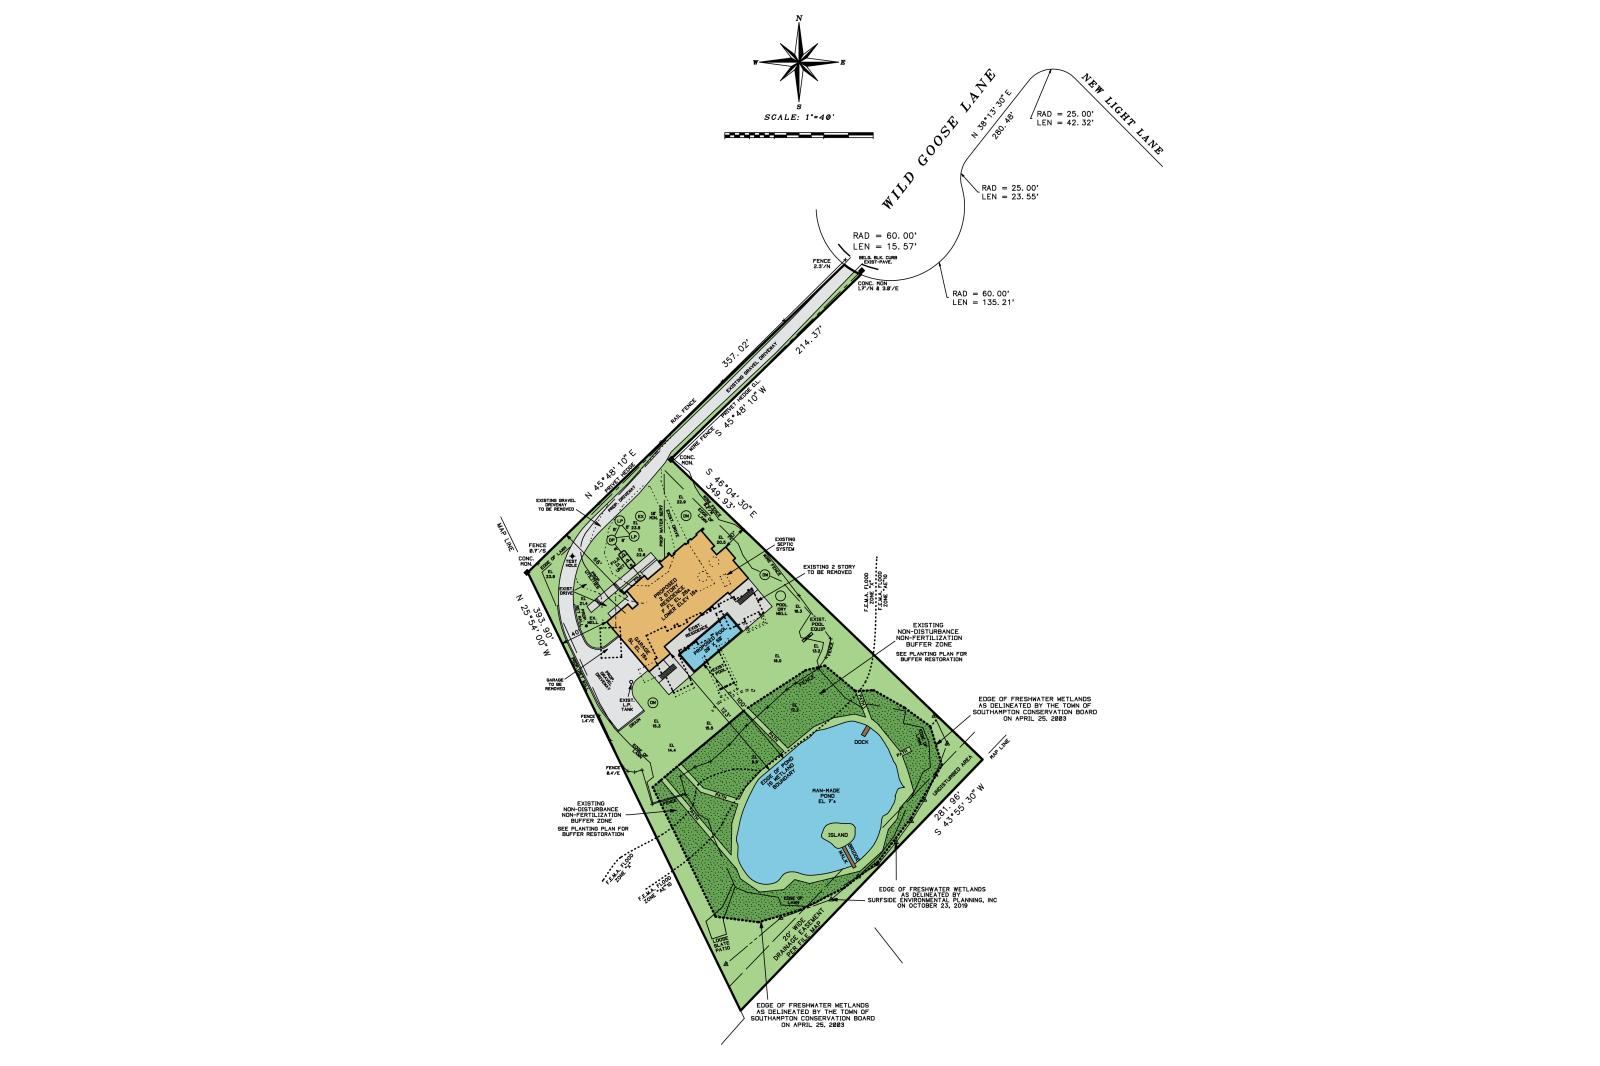 41 Wild Goose Lane Survey